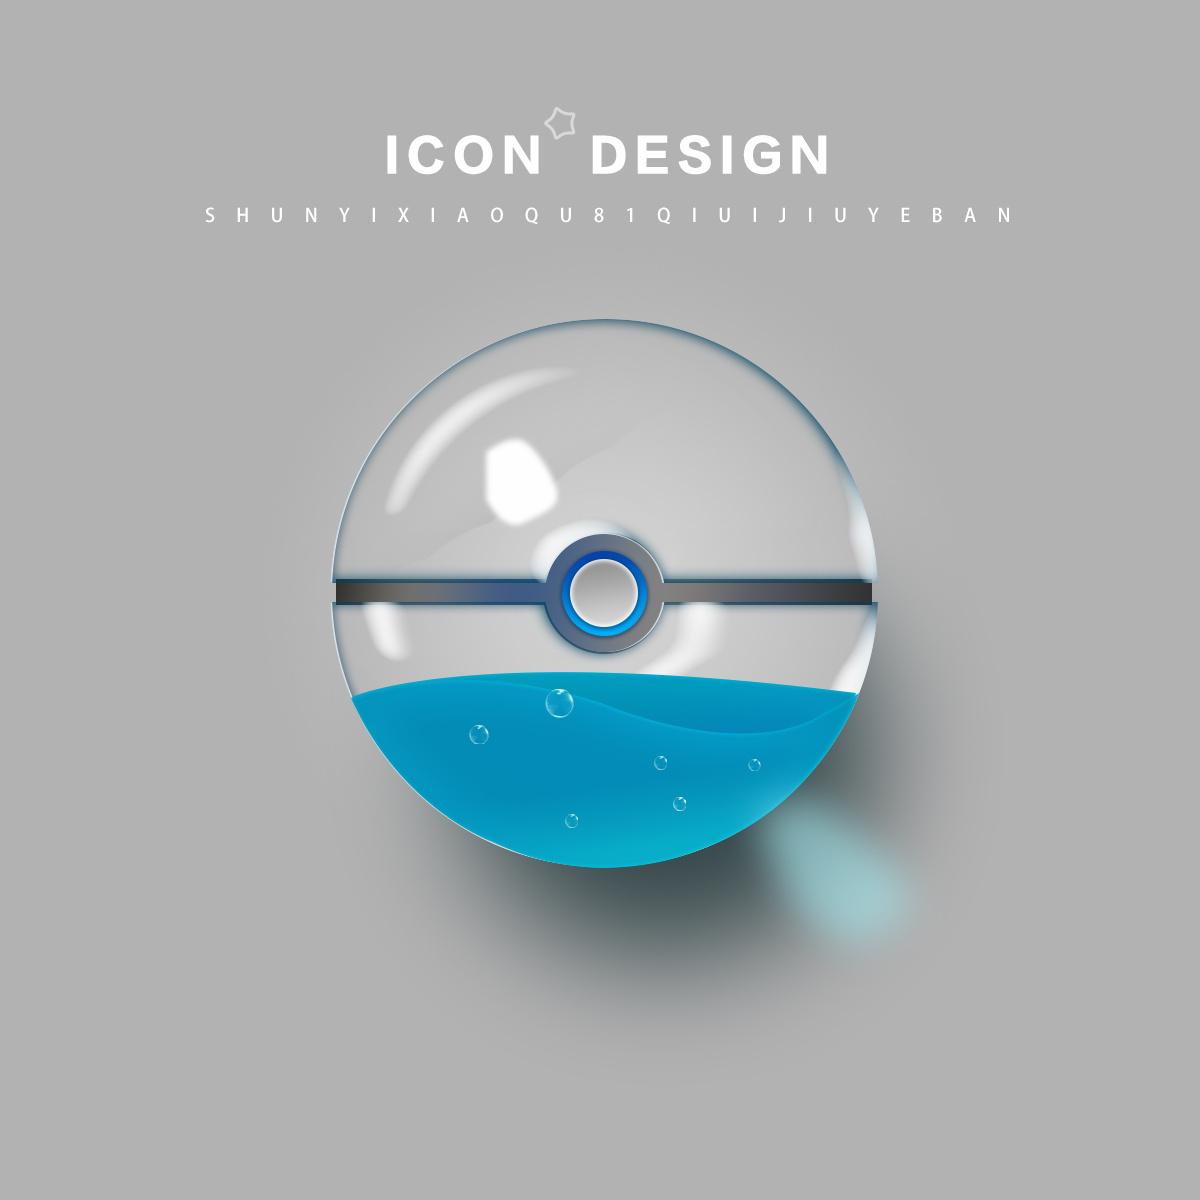 神奇宝贝球icon